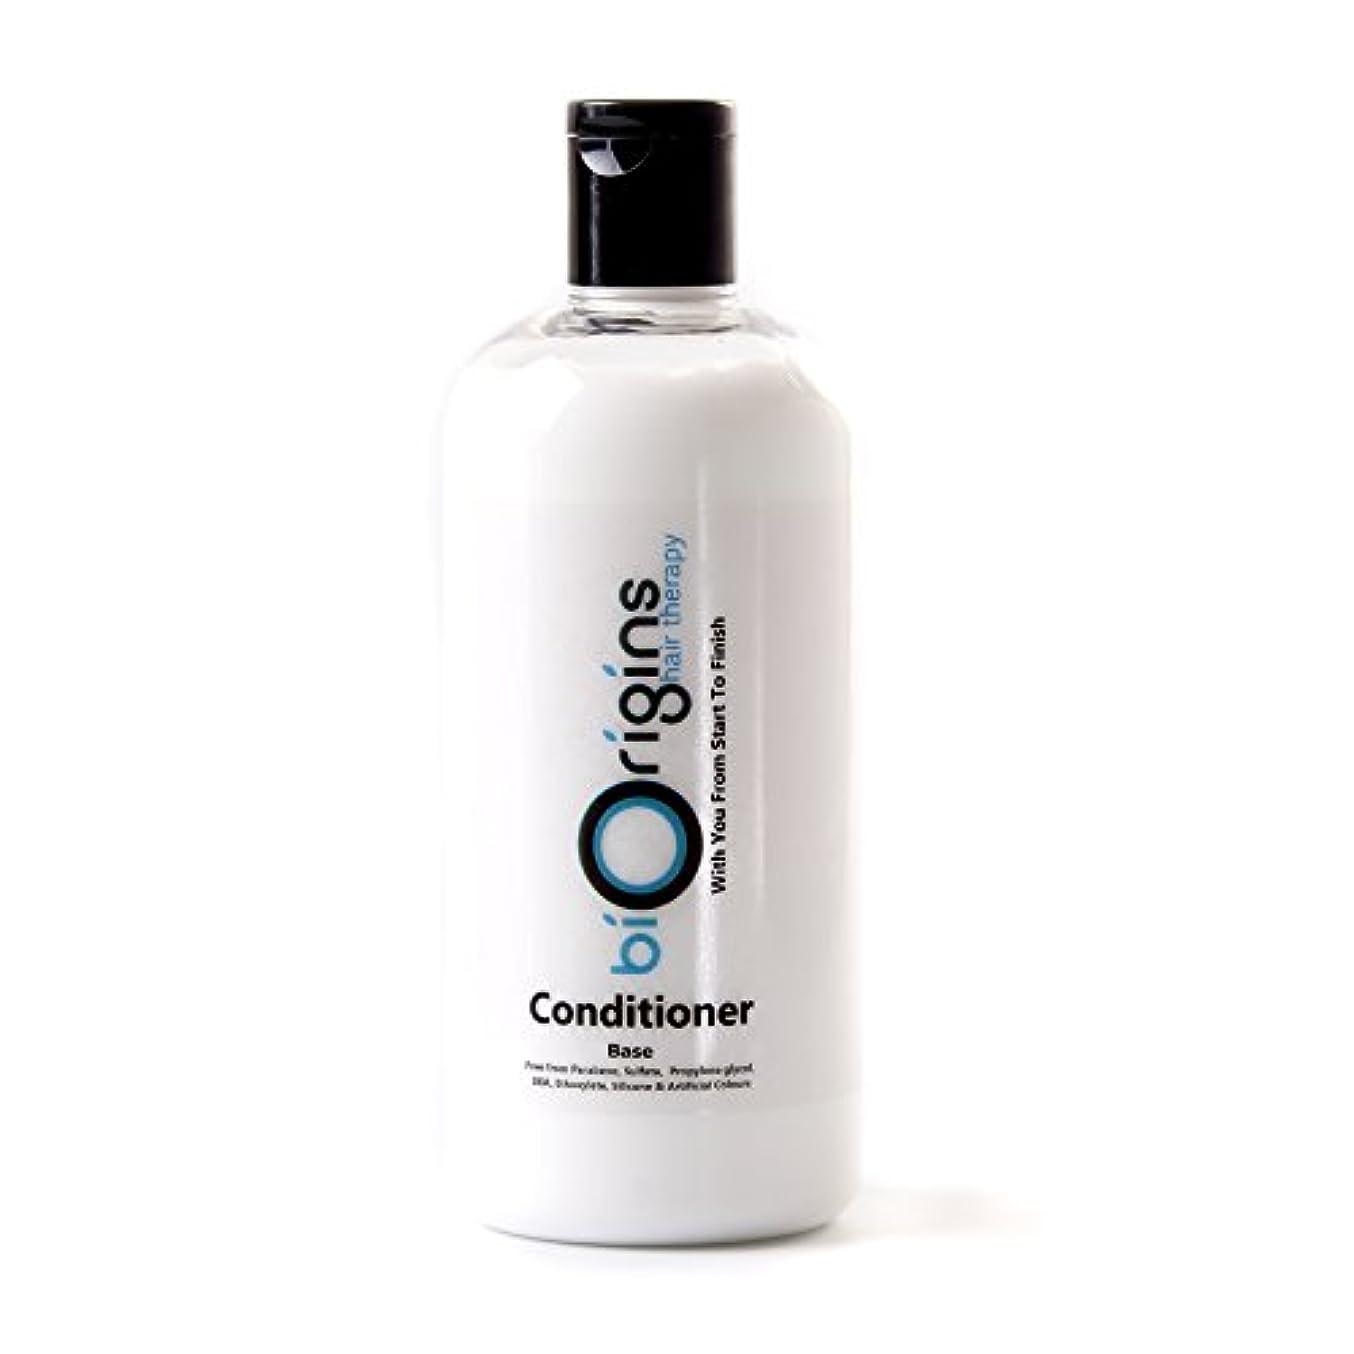 Conditioner Base Natural Unscented - 500g